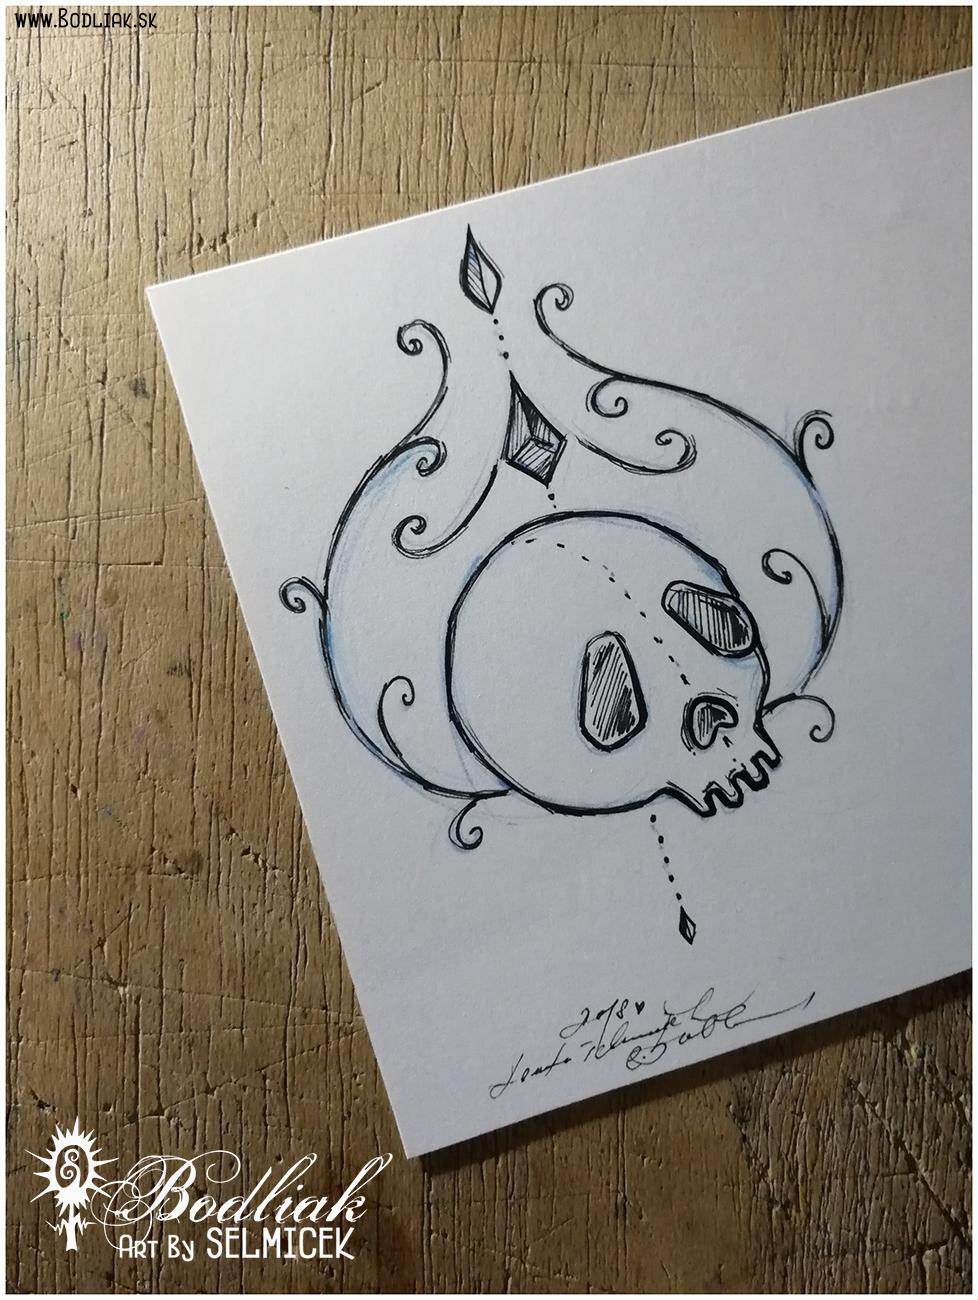 Bubák lebkový   autor: Selmicek  12cm x 9,5cm